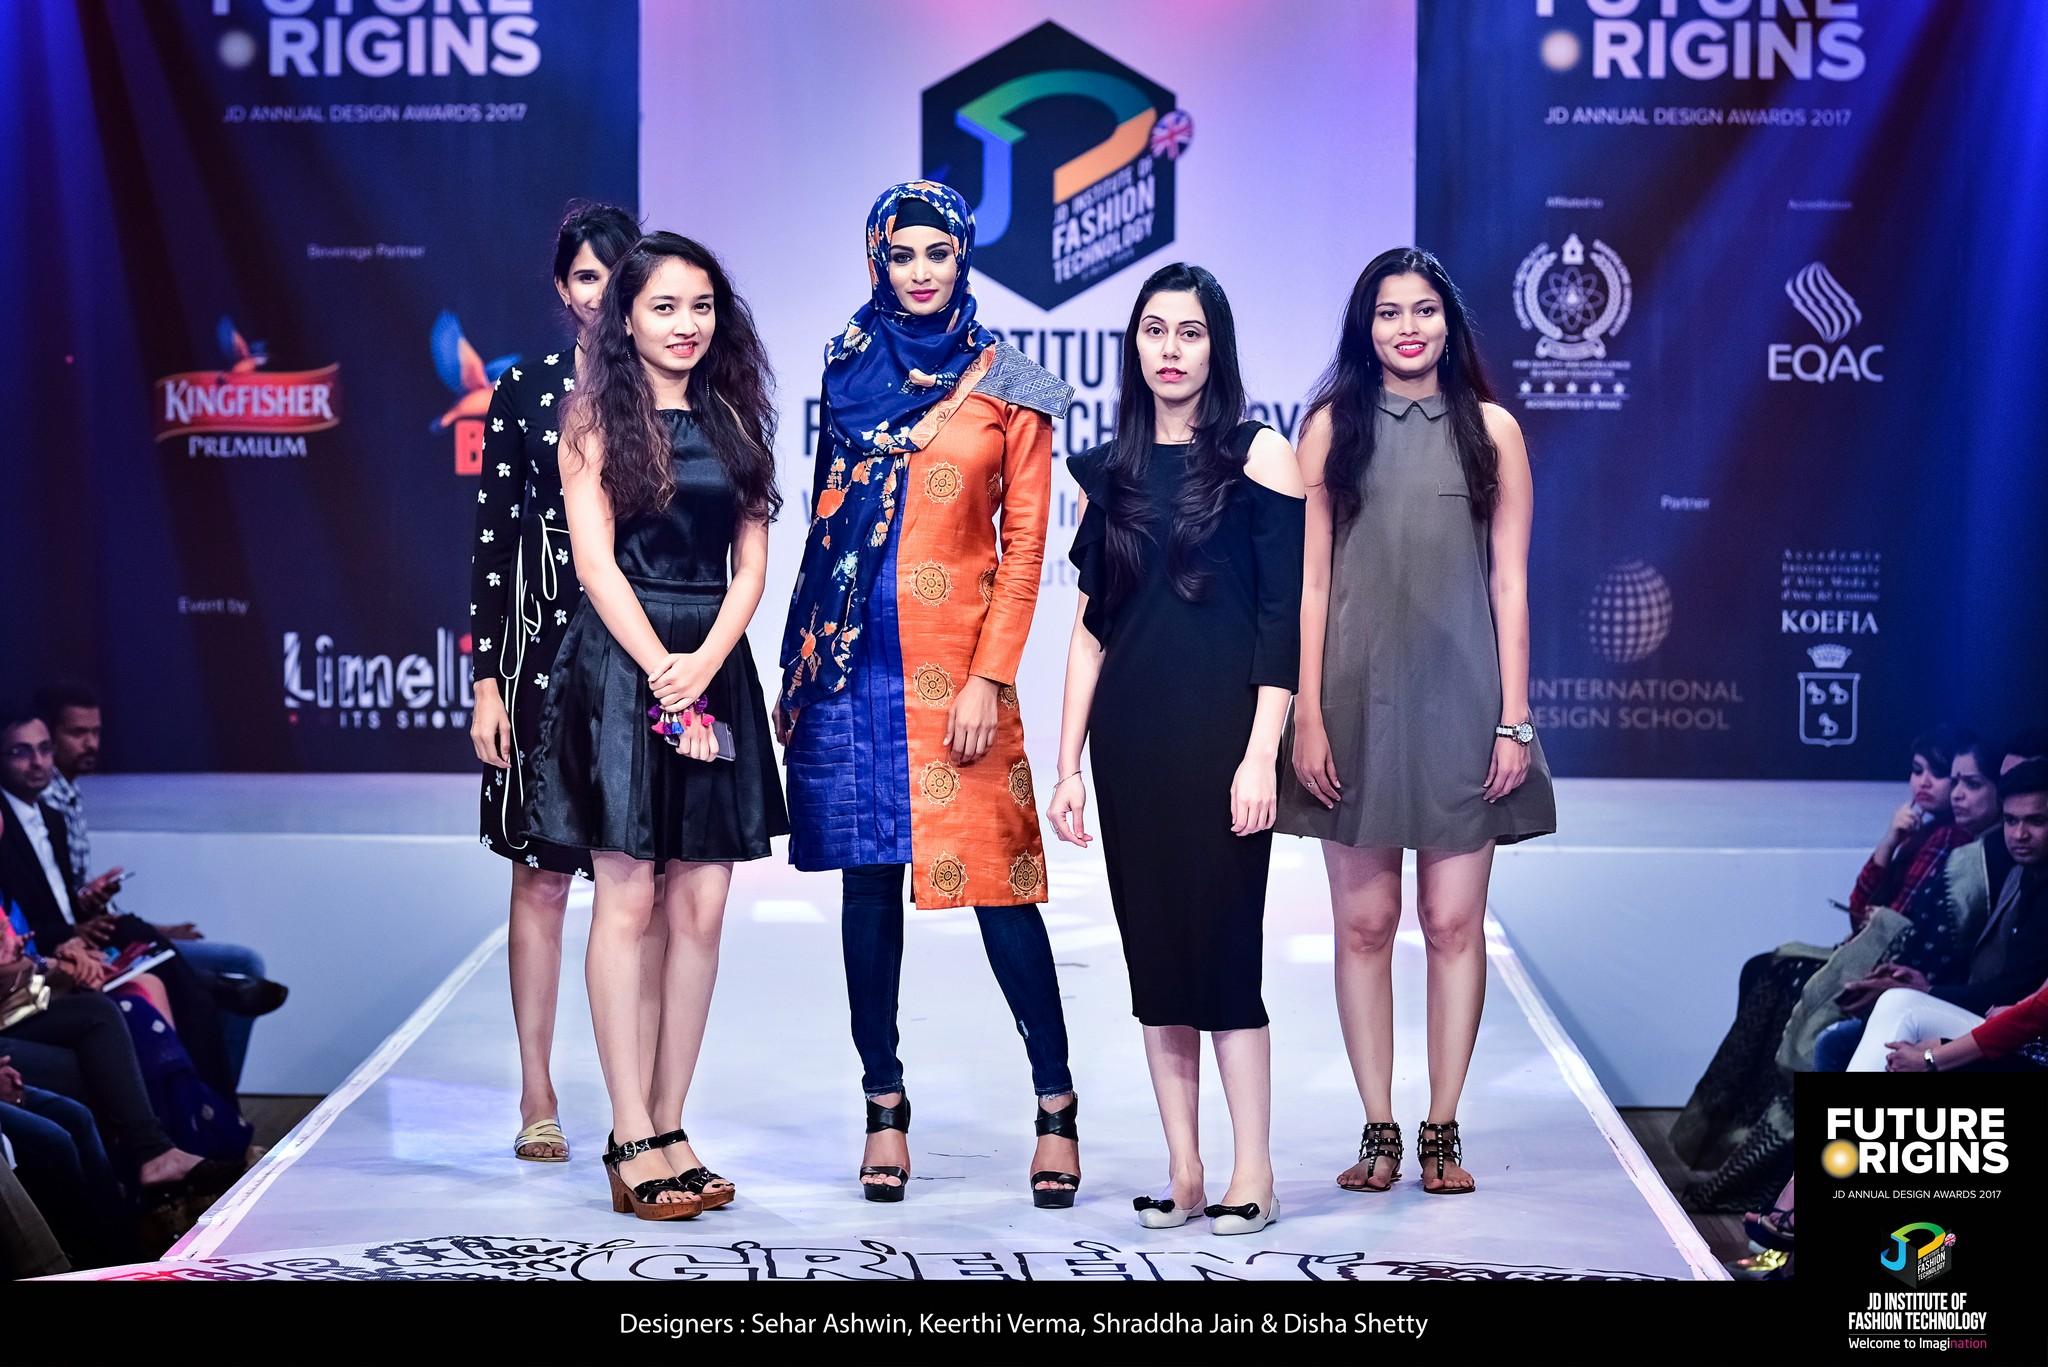 Inaayat - Future Origin - JD Annual Design Awards 2017 | Photography : Jerin Nath (@jerin_nath) inaayat - Inaayat     Future Origin     JD Annual Design Awards 2017 7 - Inaayat – Future Origin – JD Annual Design Awards 2017